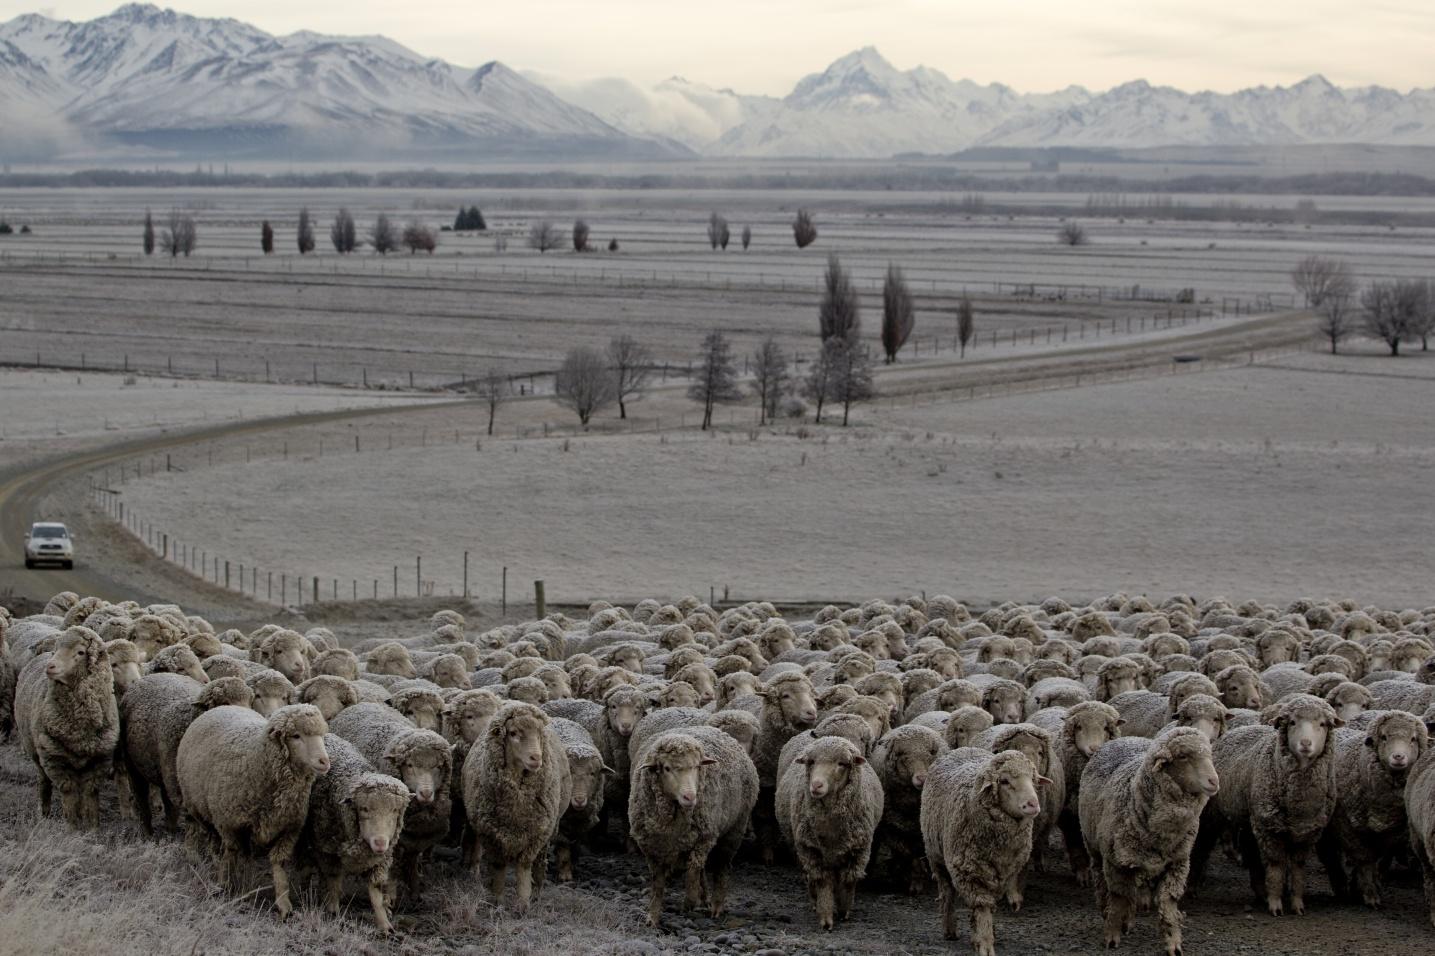 BRAND-2017-SHEEP-GLENCARIN-STATION-CAMILLA-RUTHERFORD